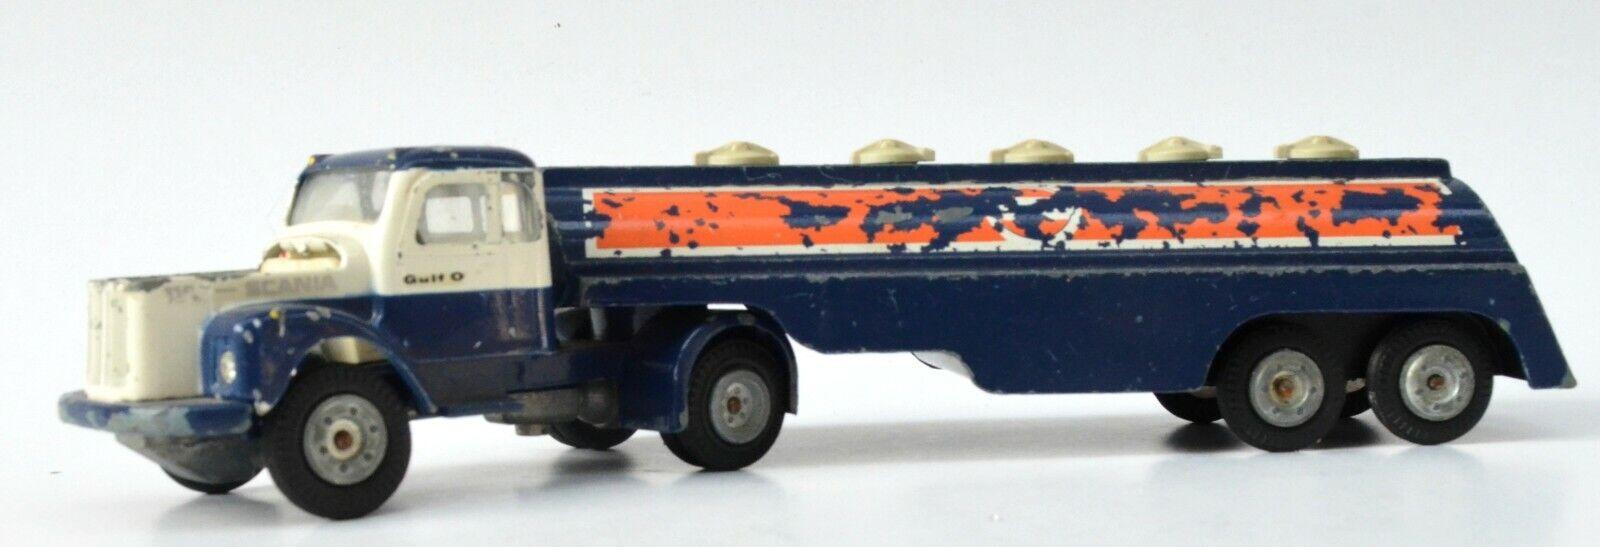 Scania Vabis 110 tank truck Tekno - Sweeden No. 447 with  Gulf  logo.